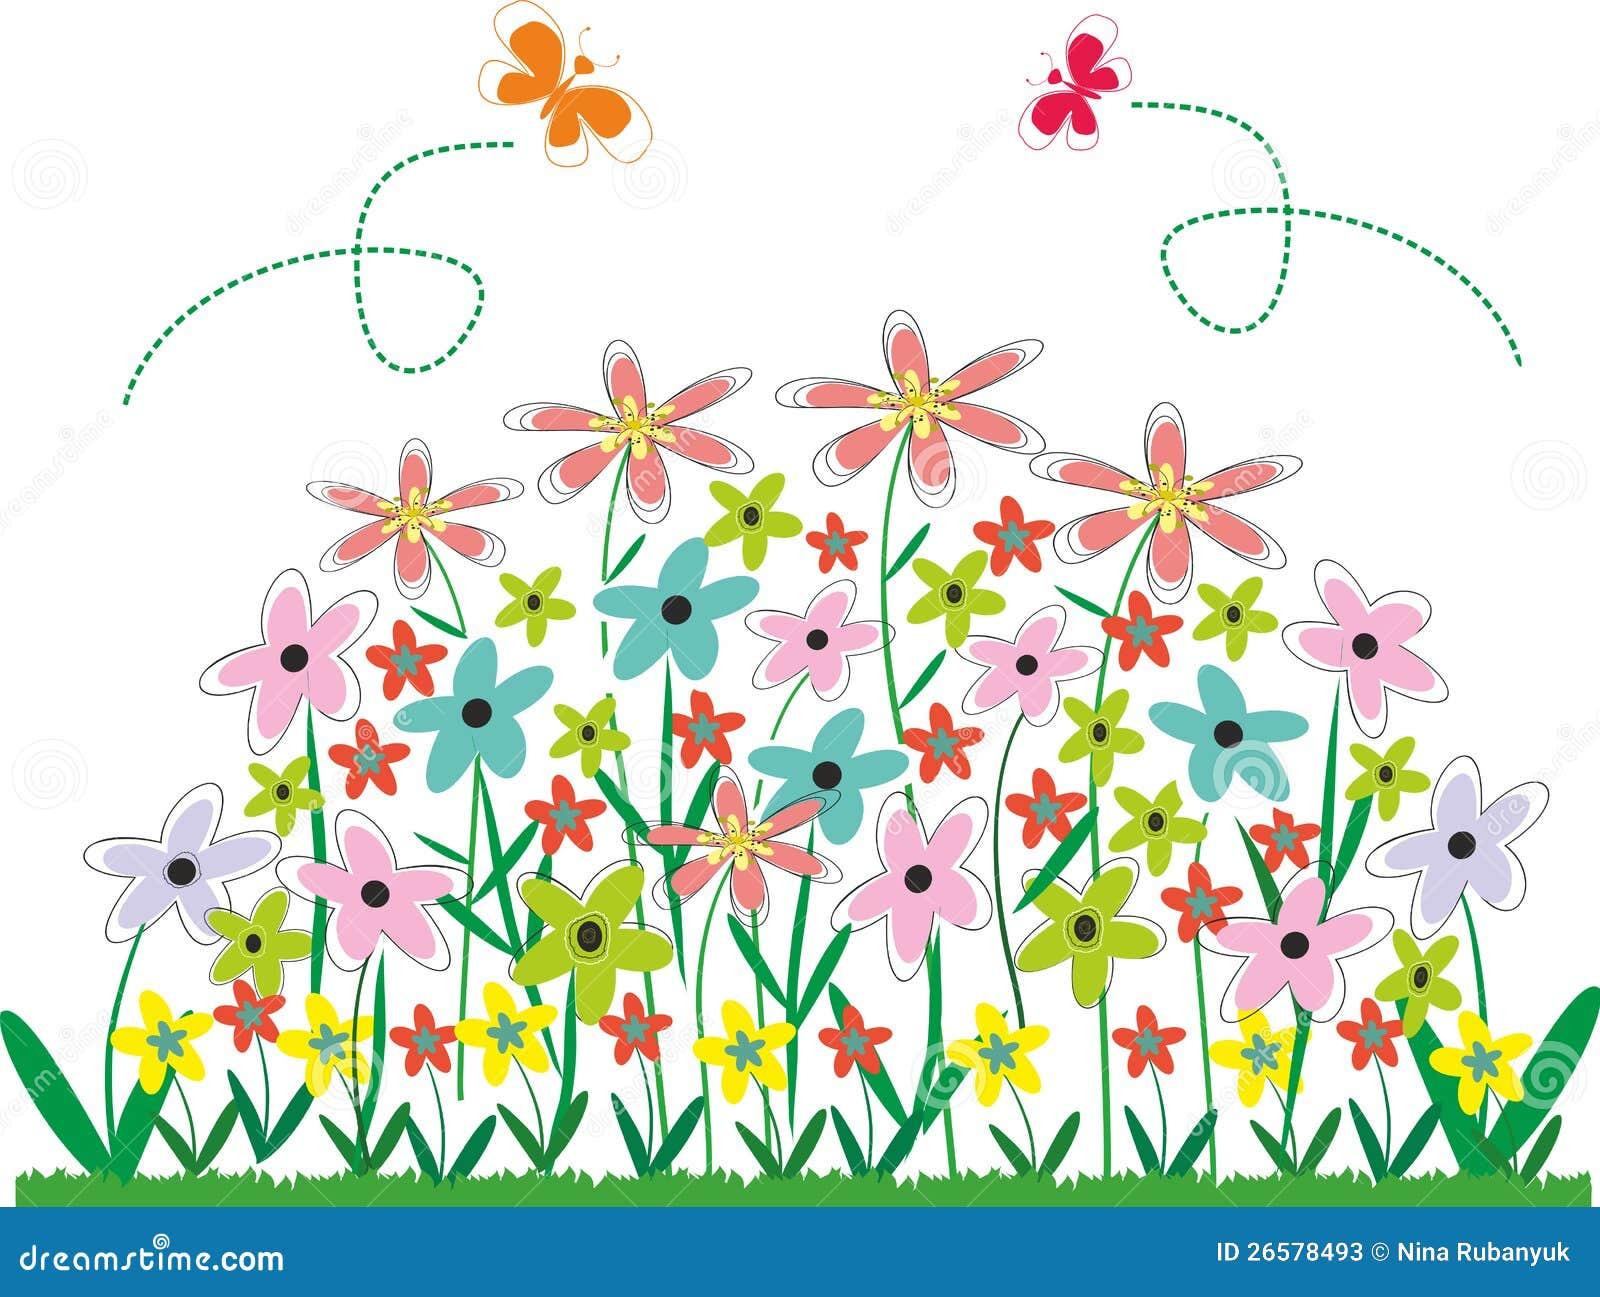 Flower garden cartoon - Bed Flower